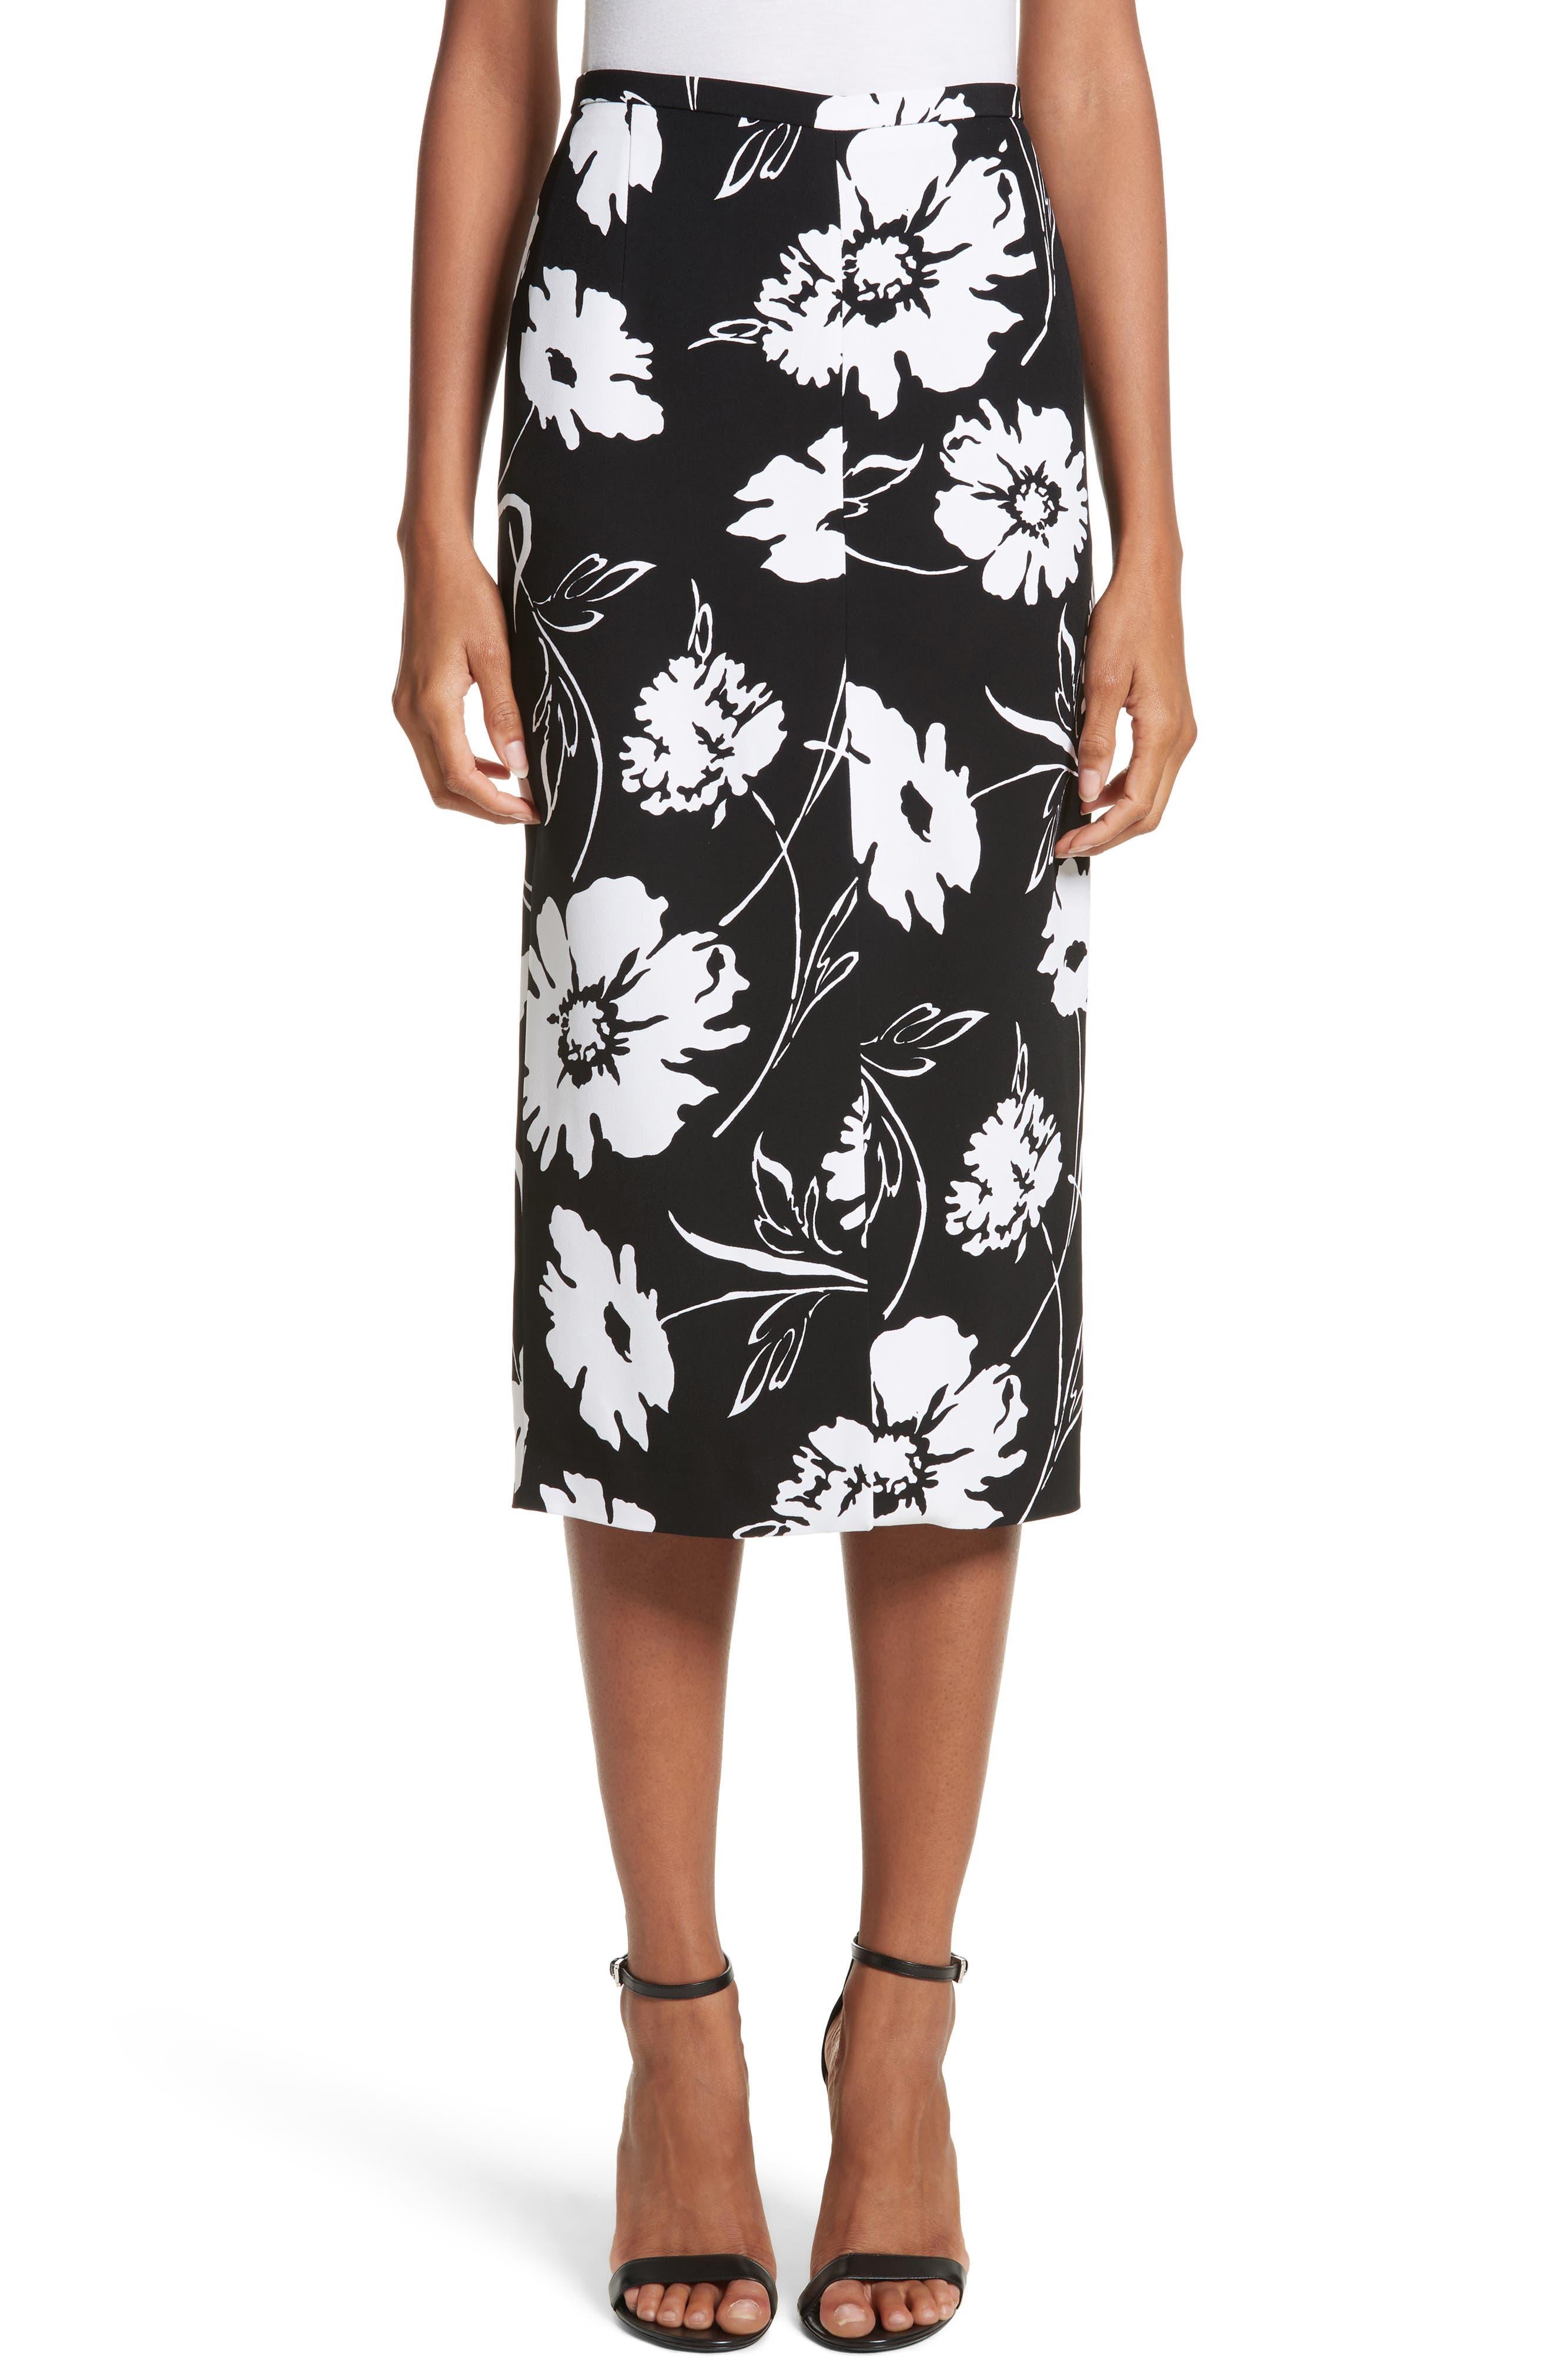 Floral Print Pencil Skirt,                             Main thumbnail 1, color,                             Black / White